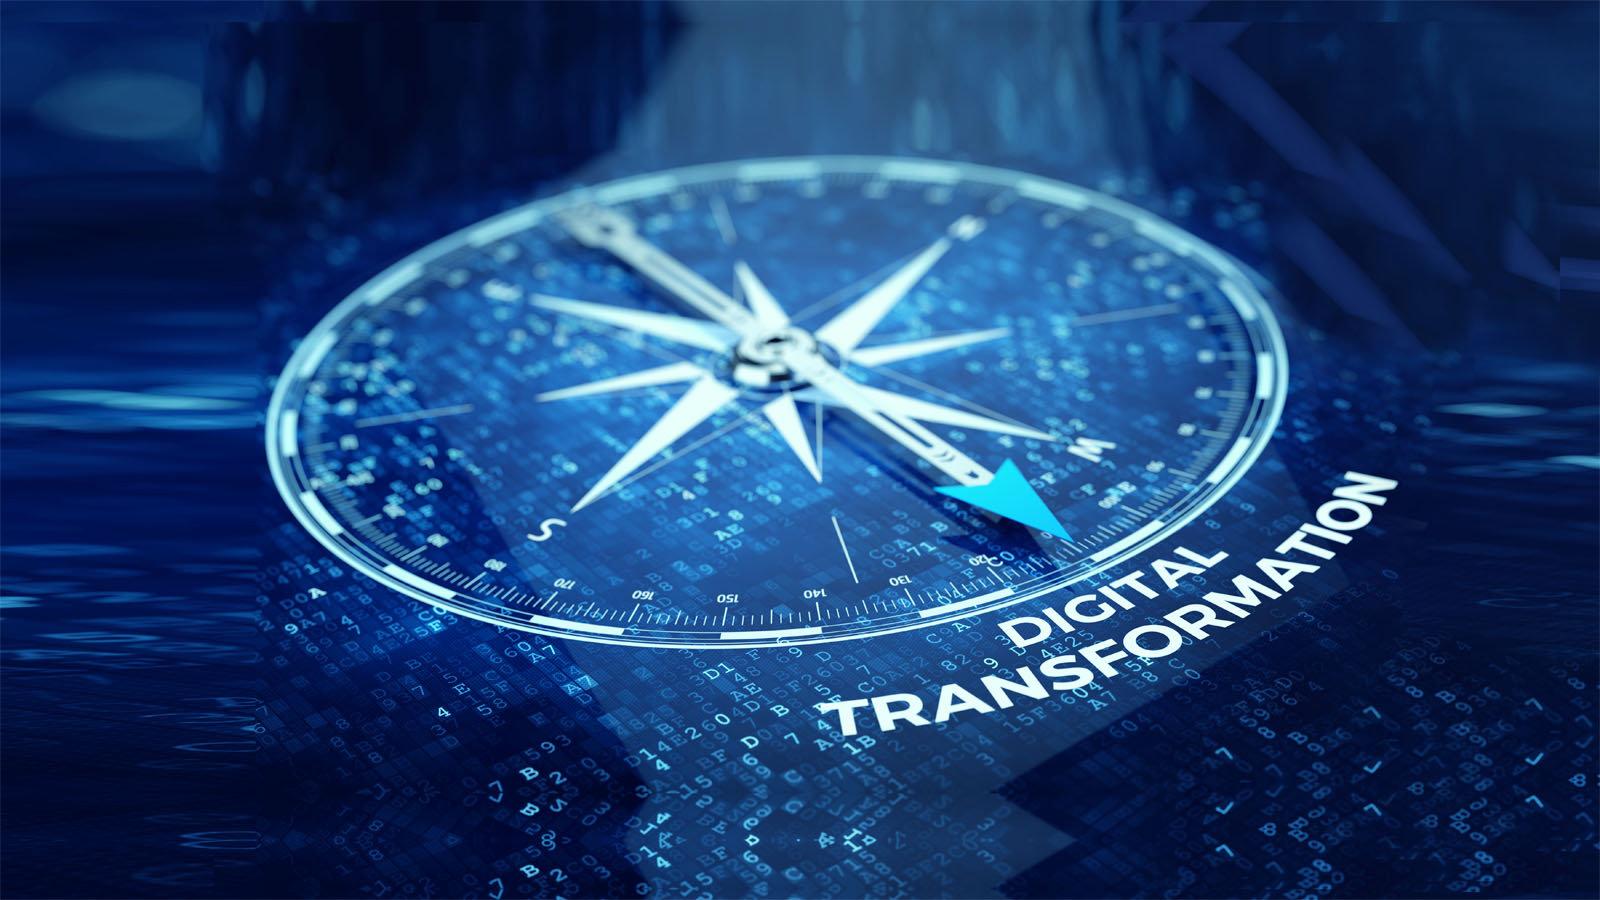 My Digital Transformation Journey